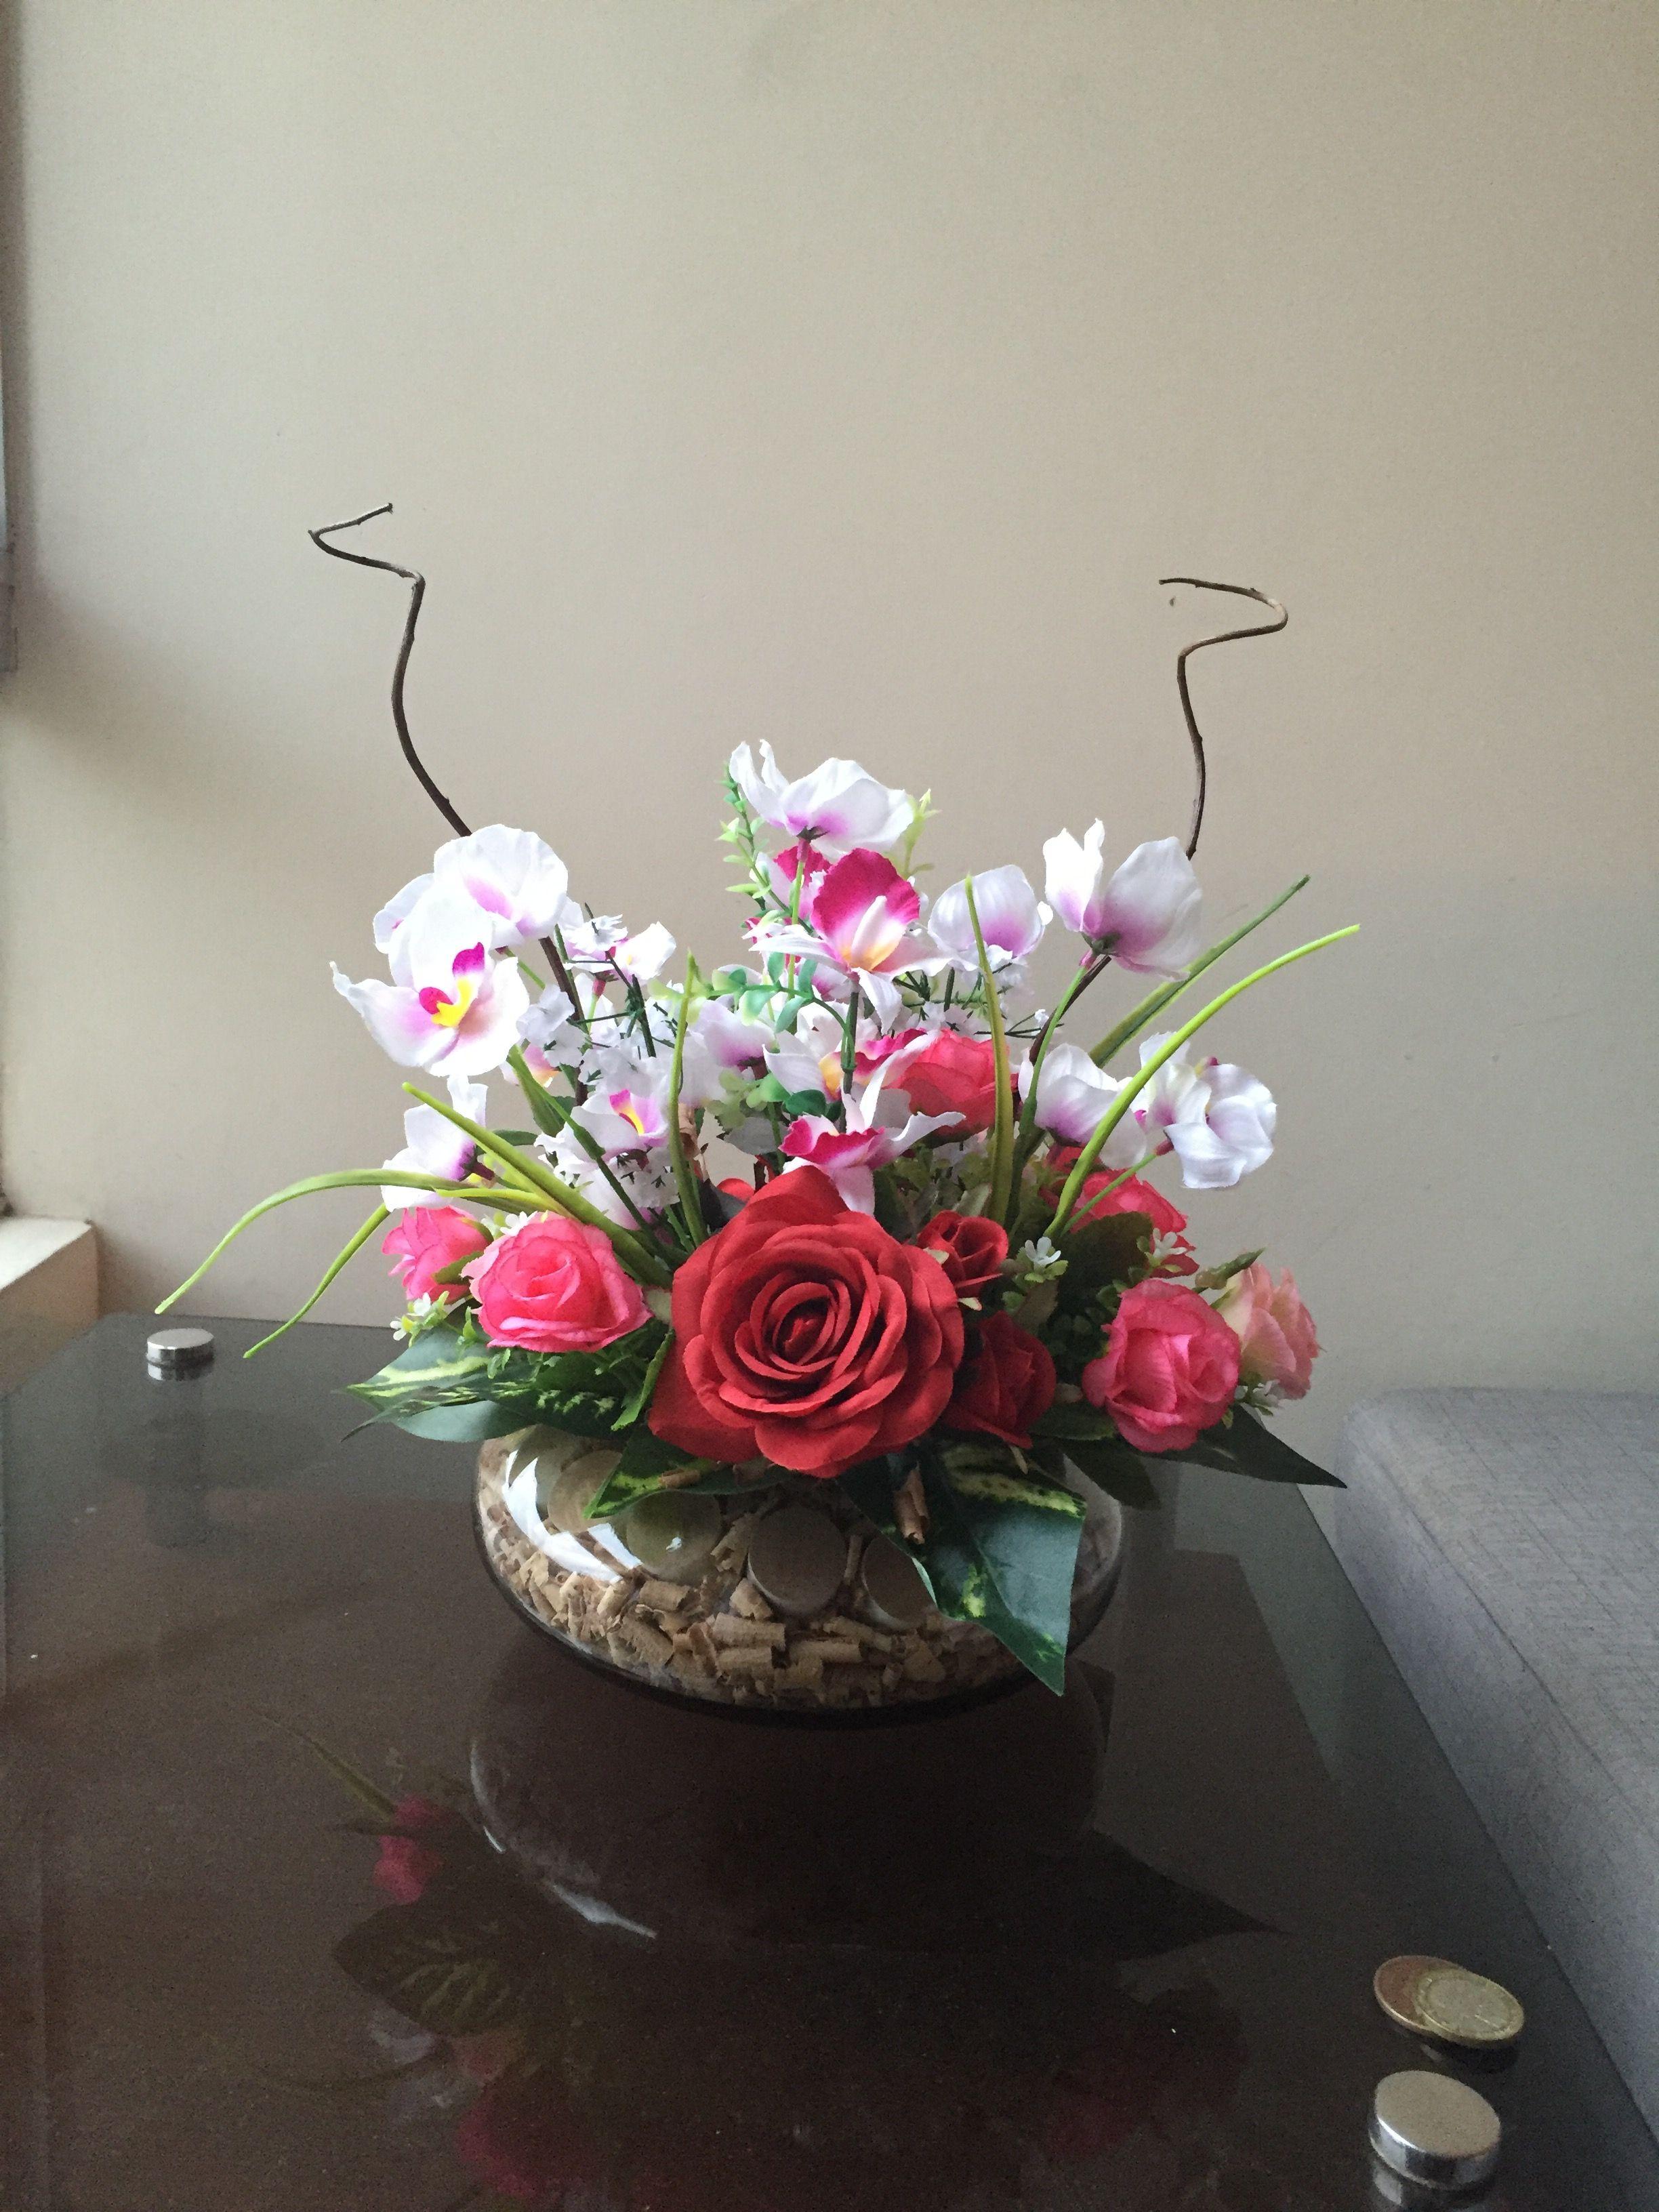 Arreglo con flores artificiales con toques ecol gicos para un centro de mesa dise o floral - Decoracion con plantas artificiales ...